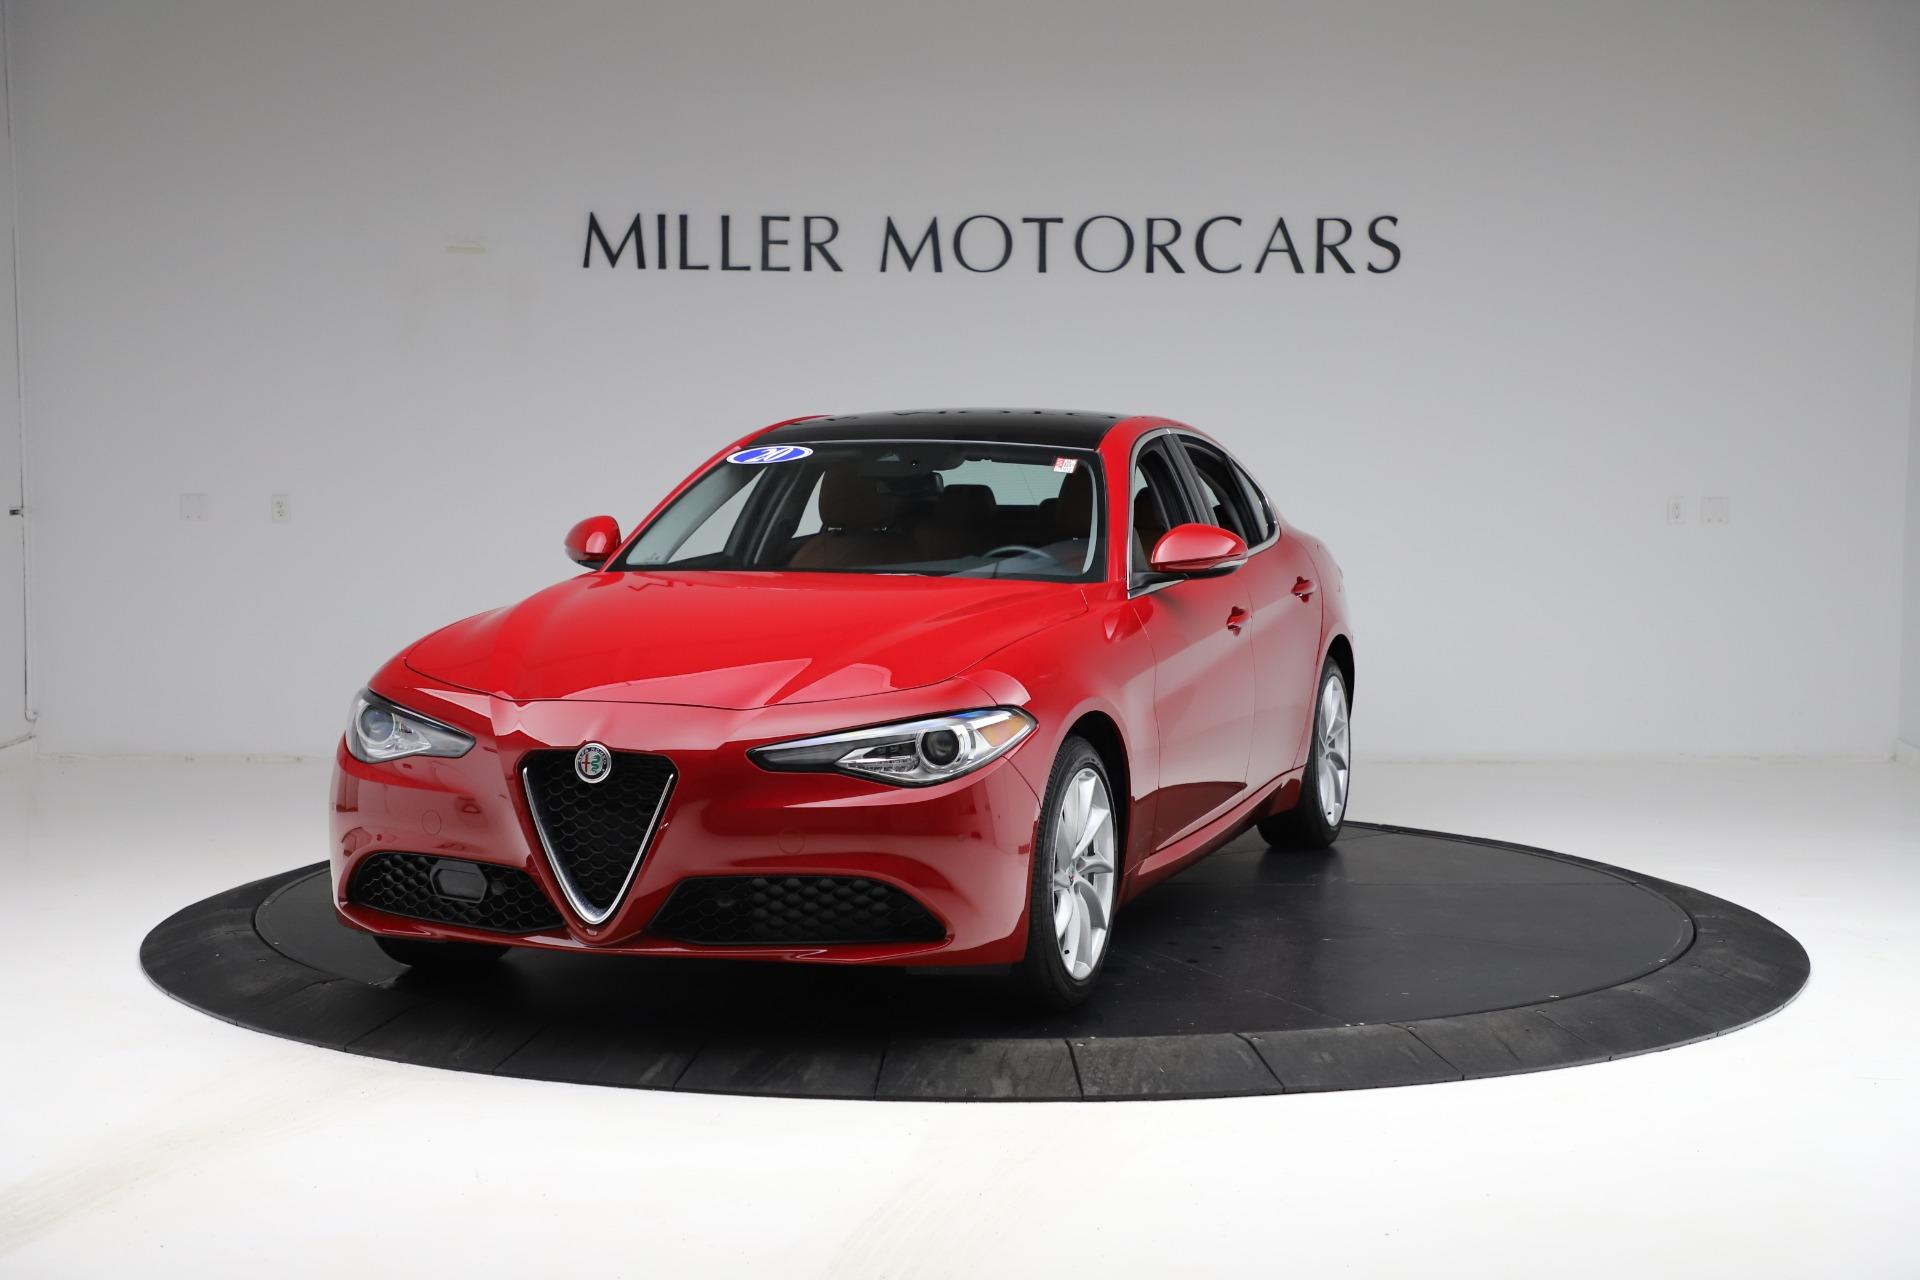 Used 2020 Alfa Romeo Giulia Q4 for sale $34,900 at Pagani of Greenwich in Greenwich CT 06830 1